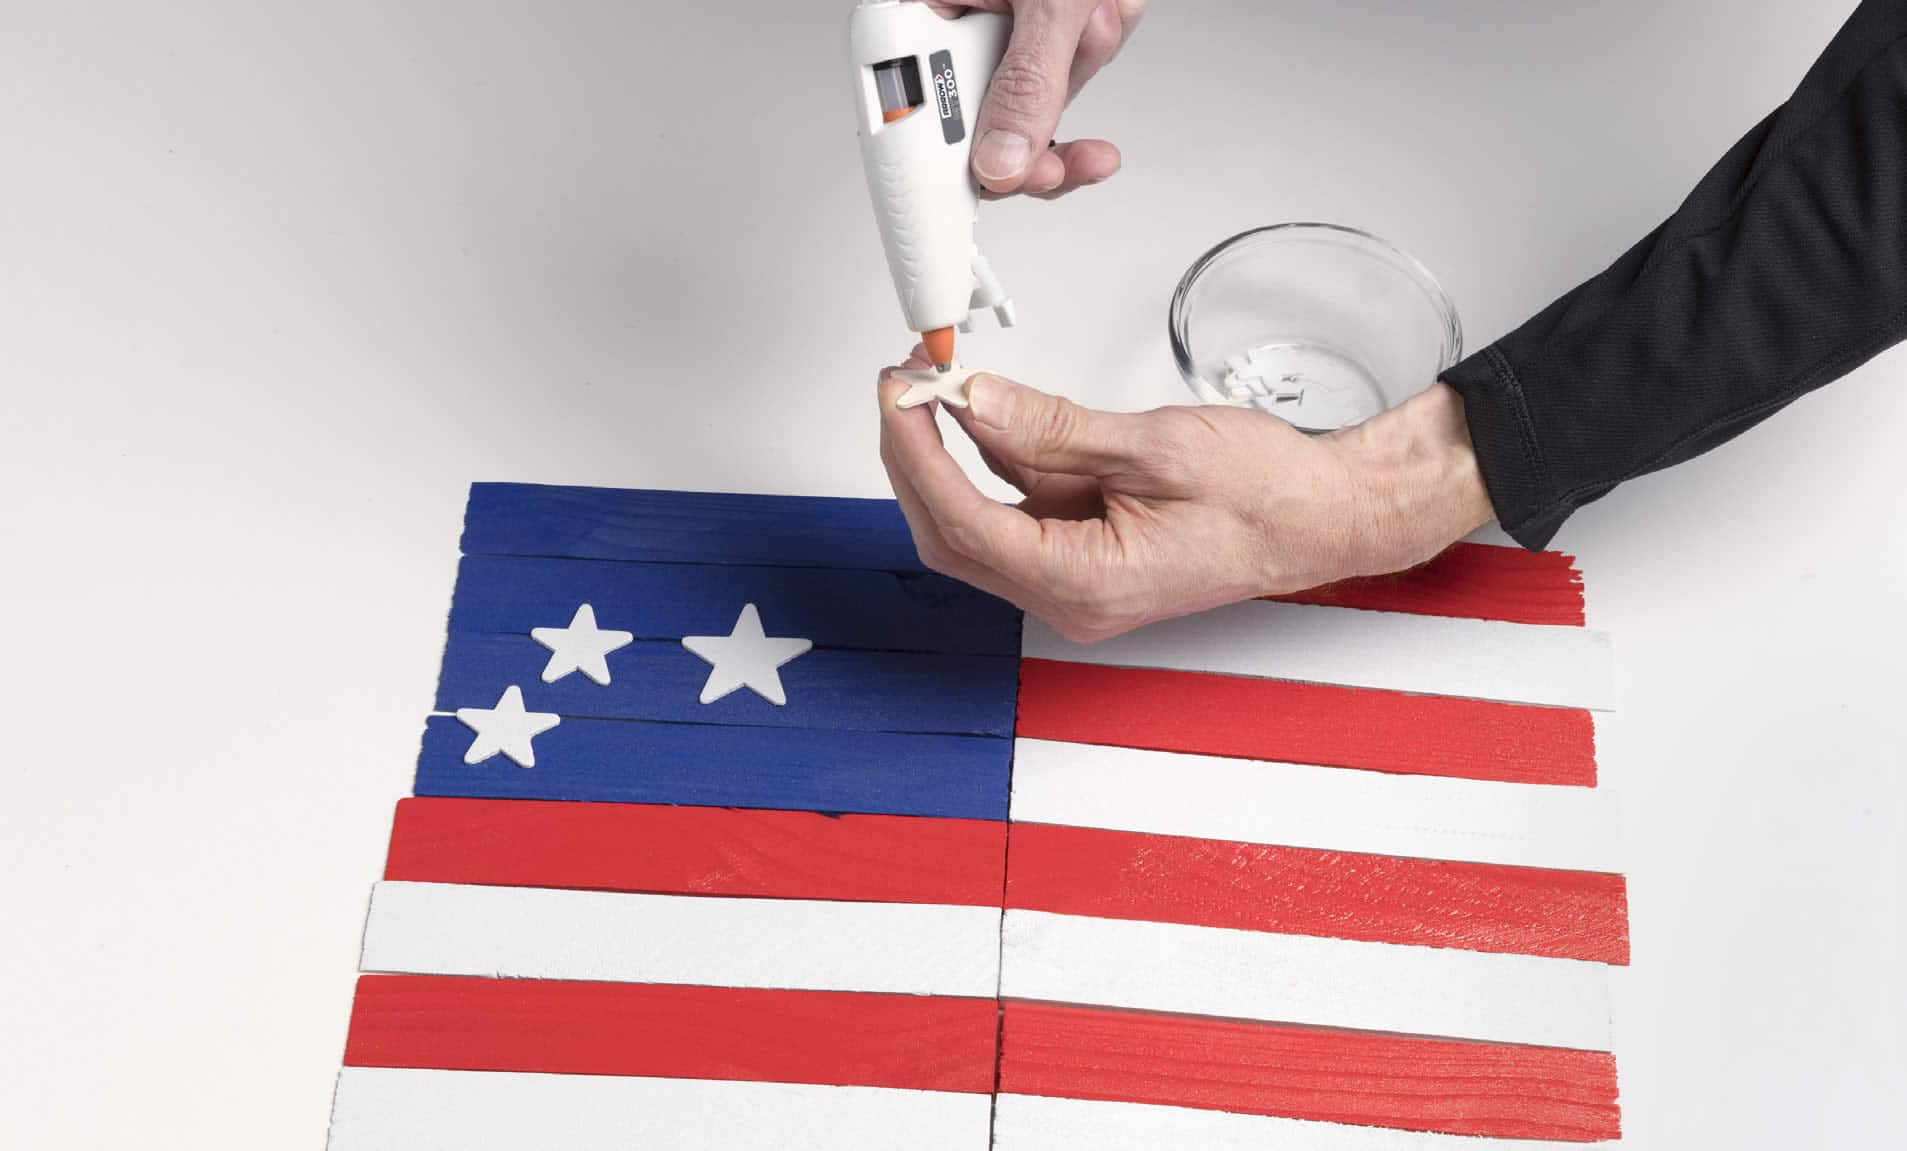 patriotic flag project